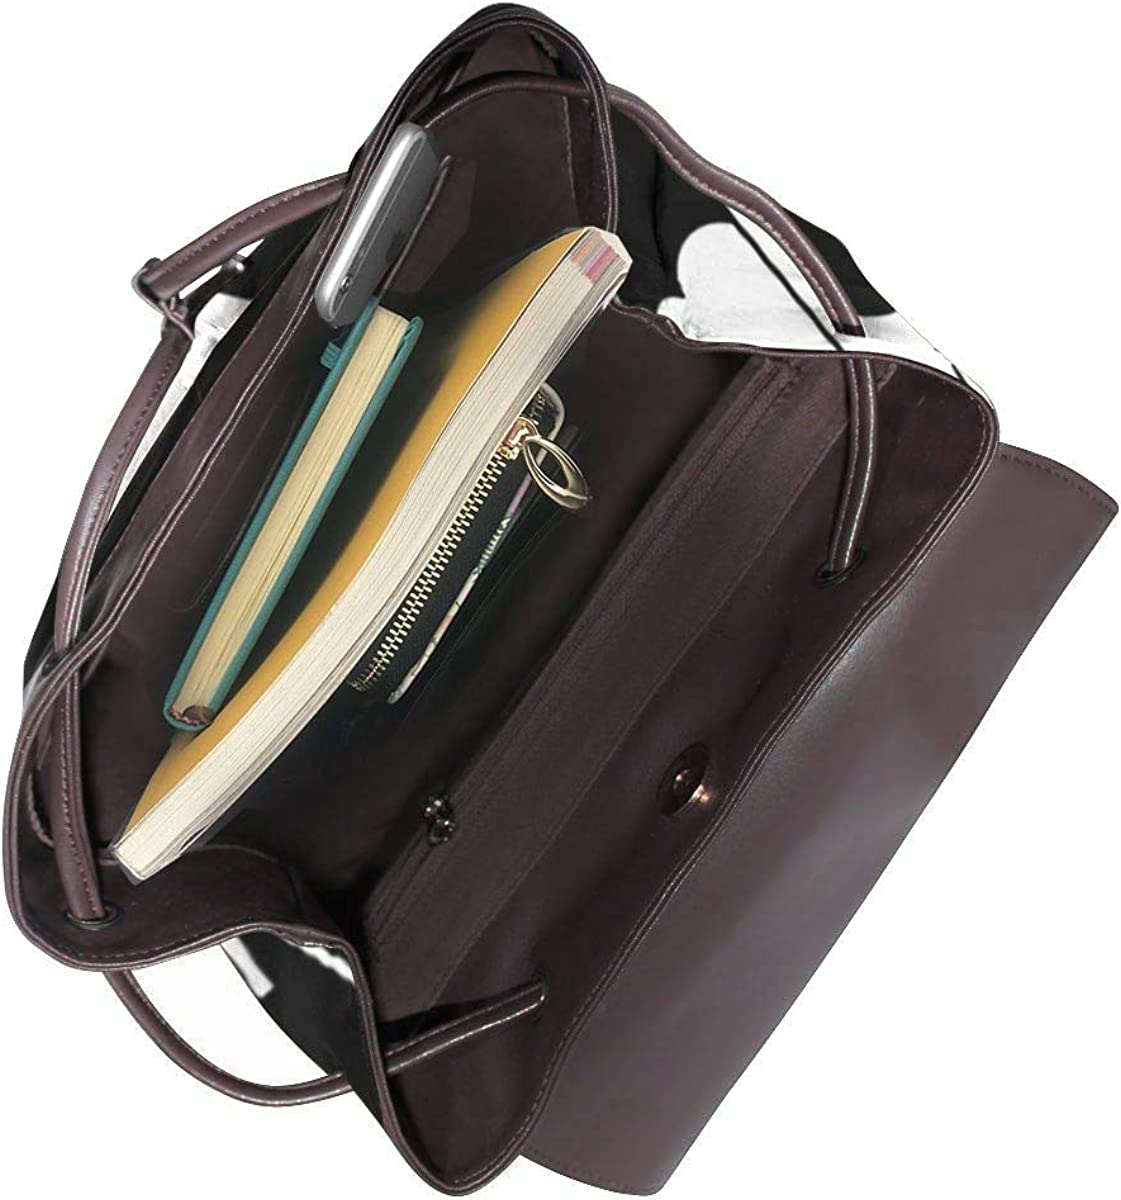 SGSKJ Rucksack Damen Mini Ea, Leder Rucksack Damen 13 Inch Laptop Rucksack Frauen Leder Schultasche Casual Daypack Schulrucksäcke Tasche Schulranzen 6